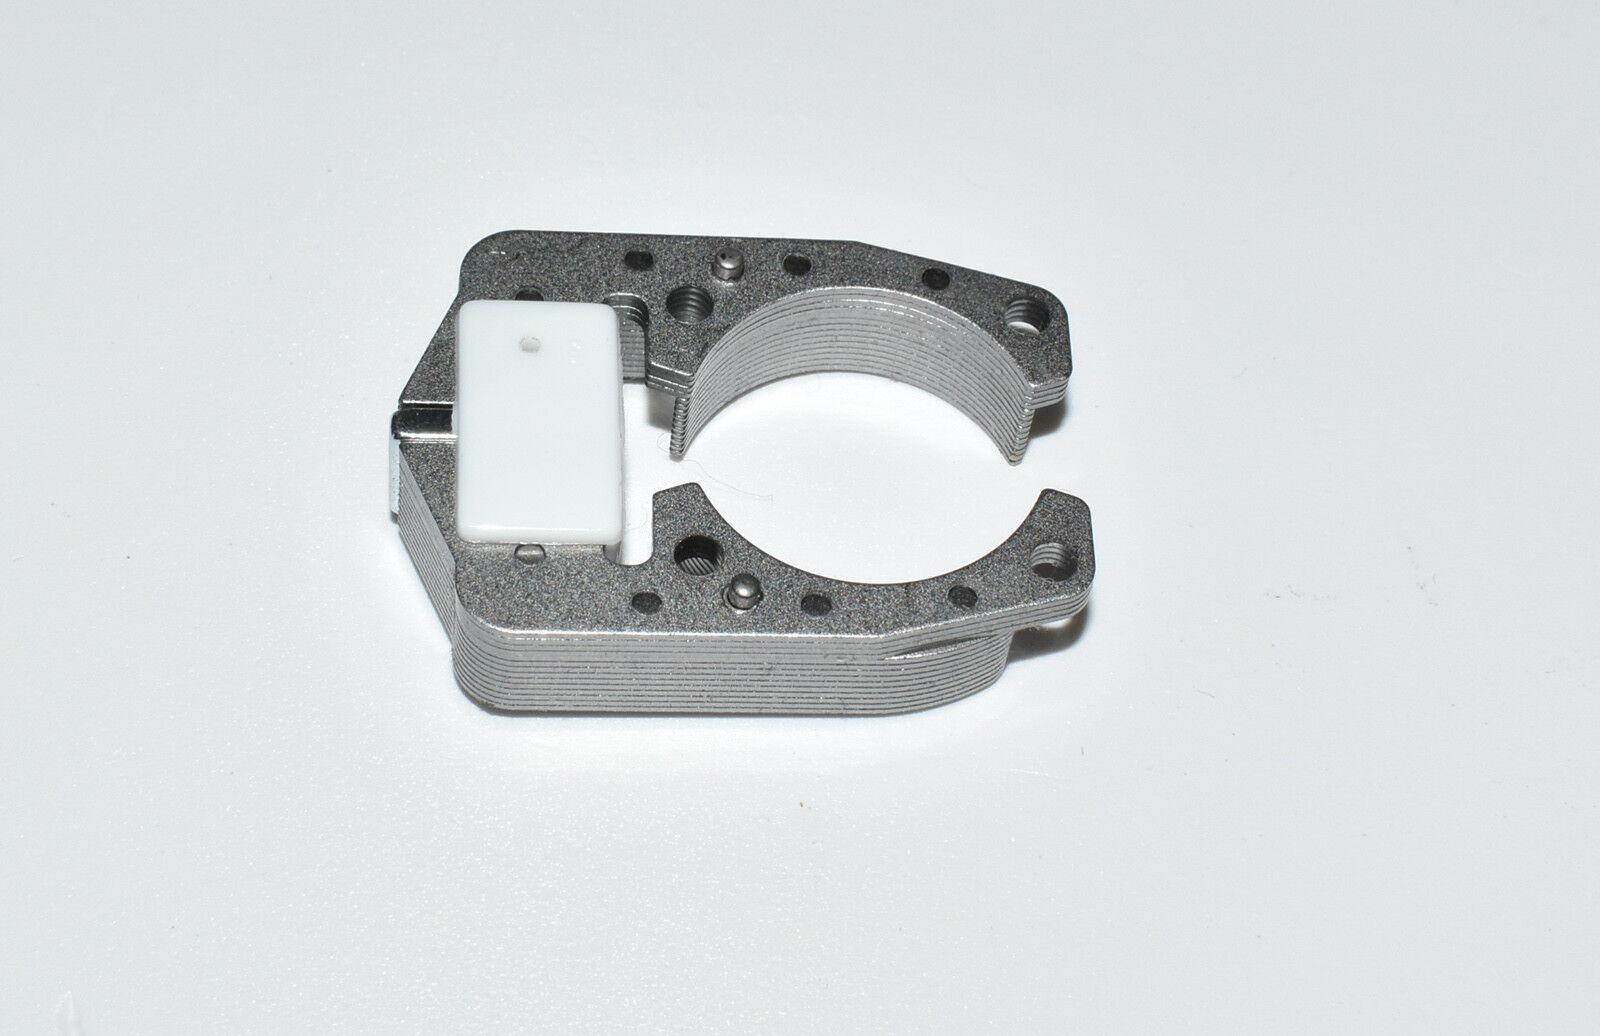 Märklin 389000 Feldmagnet Magnet Aus 60901 60760 60941 Neuware E389000